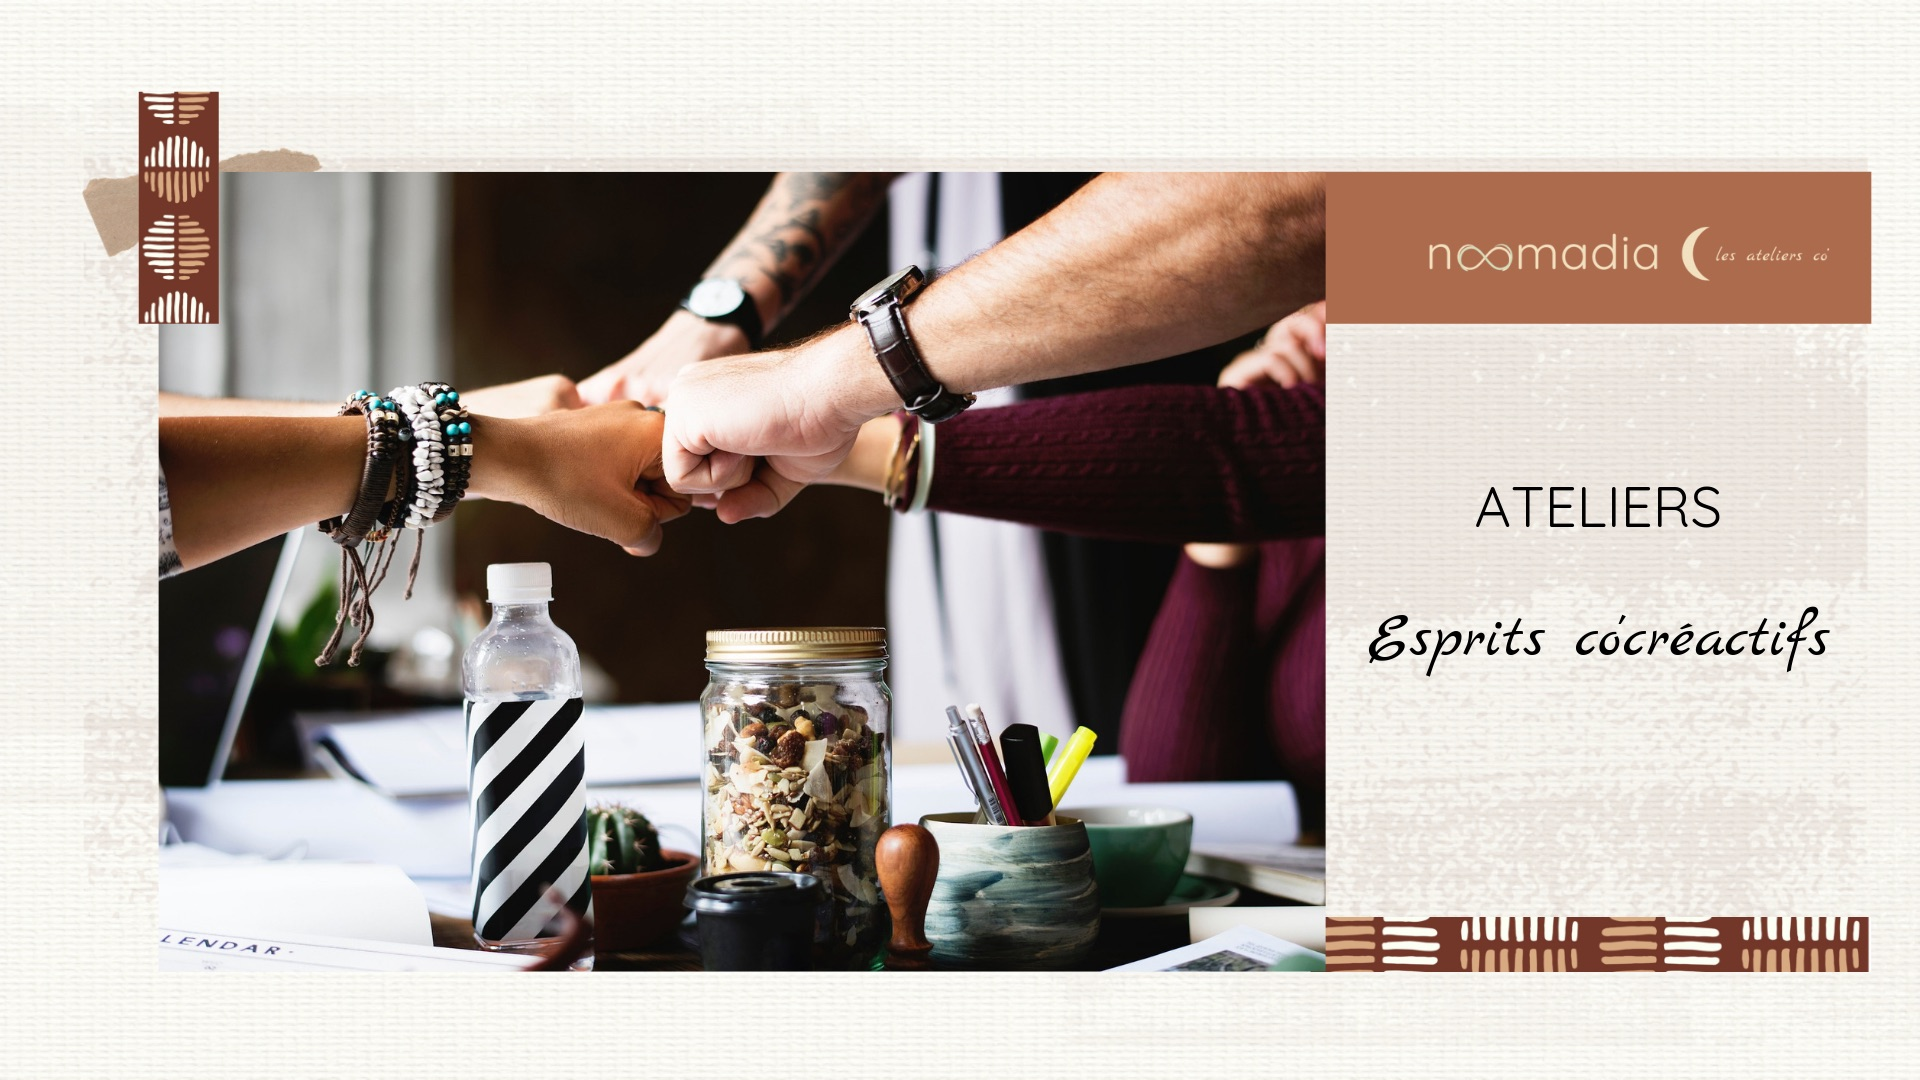 ateliers-esprits-co-créactifs-noomadia.jpg